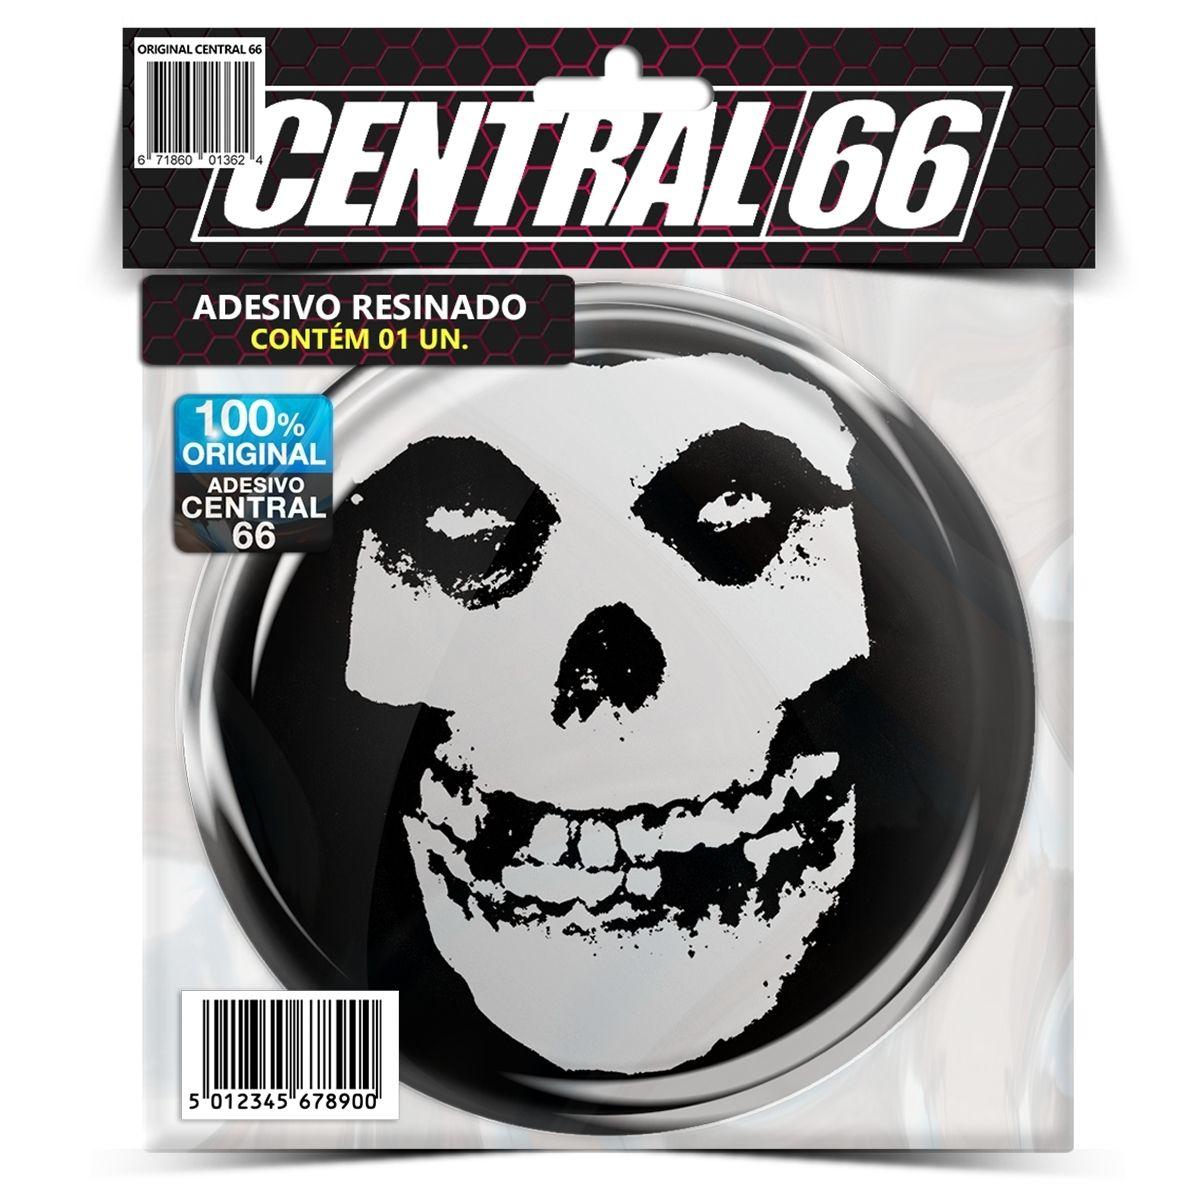 Adesivo Redondo Slipknot – Central 66